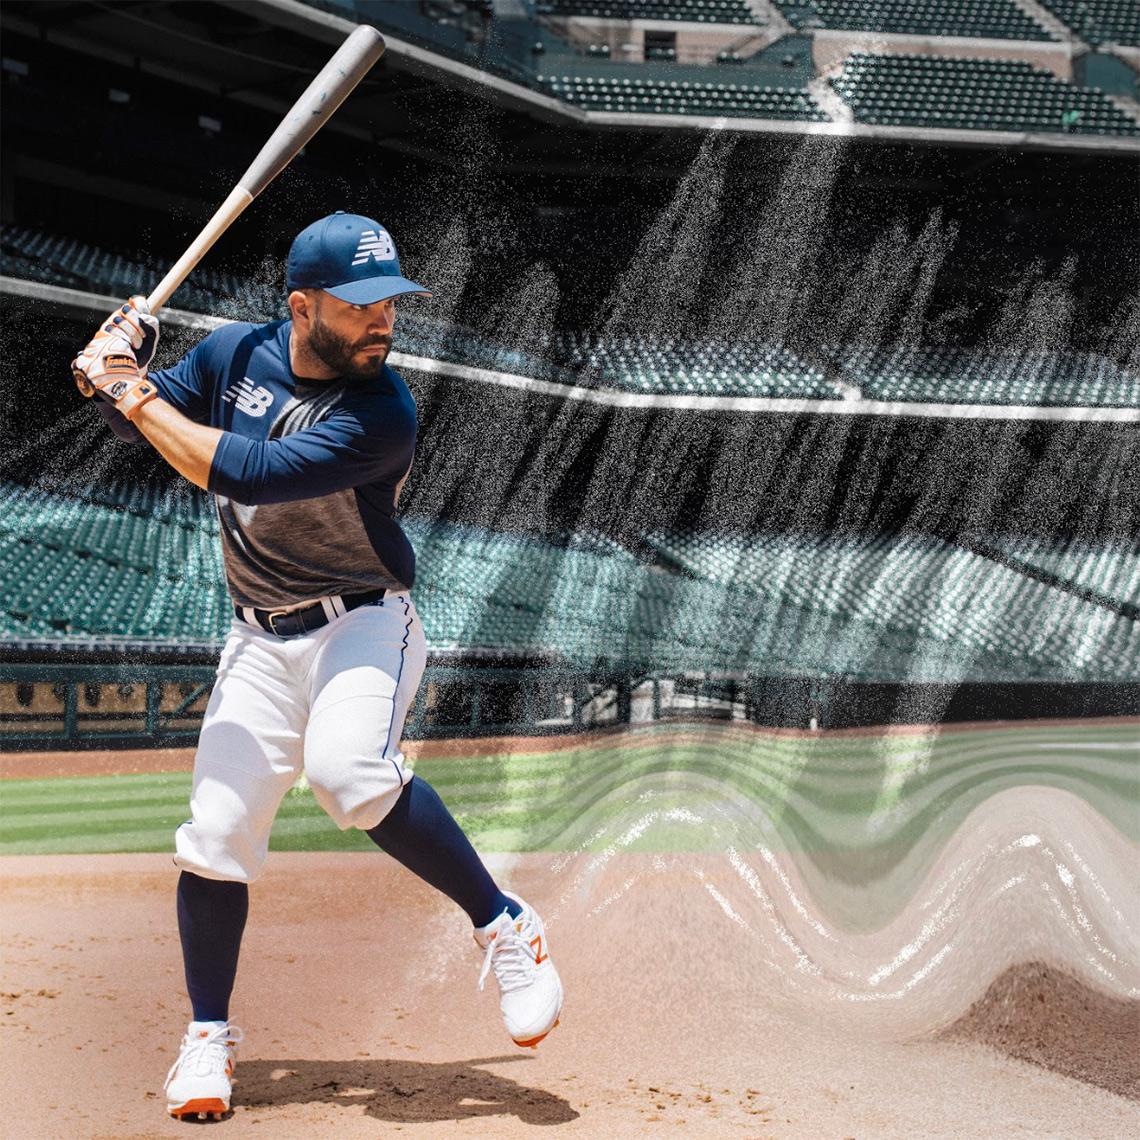 Jose Altuve New Balance 3000v4 Baseball Cleat  637dbbf1c